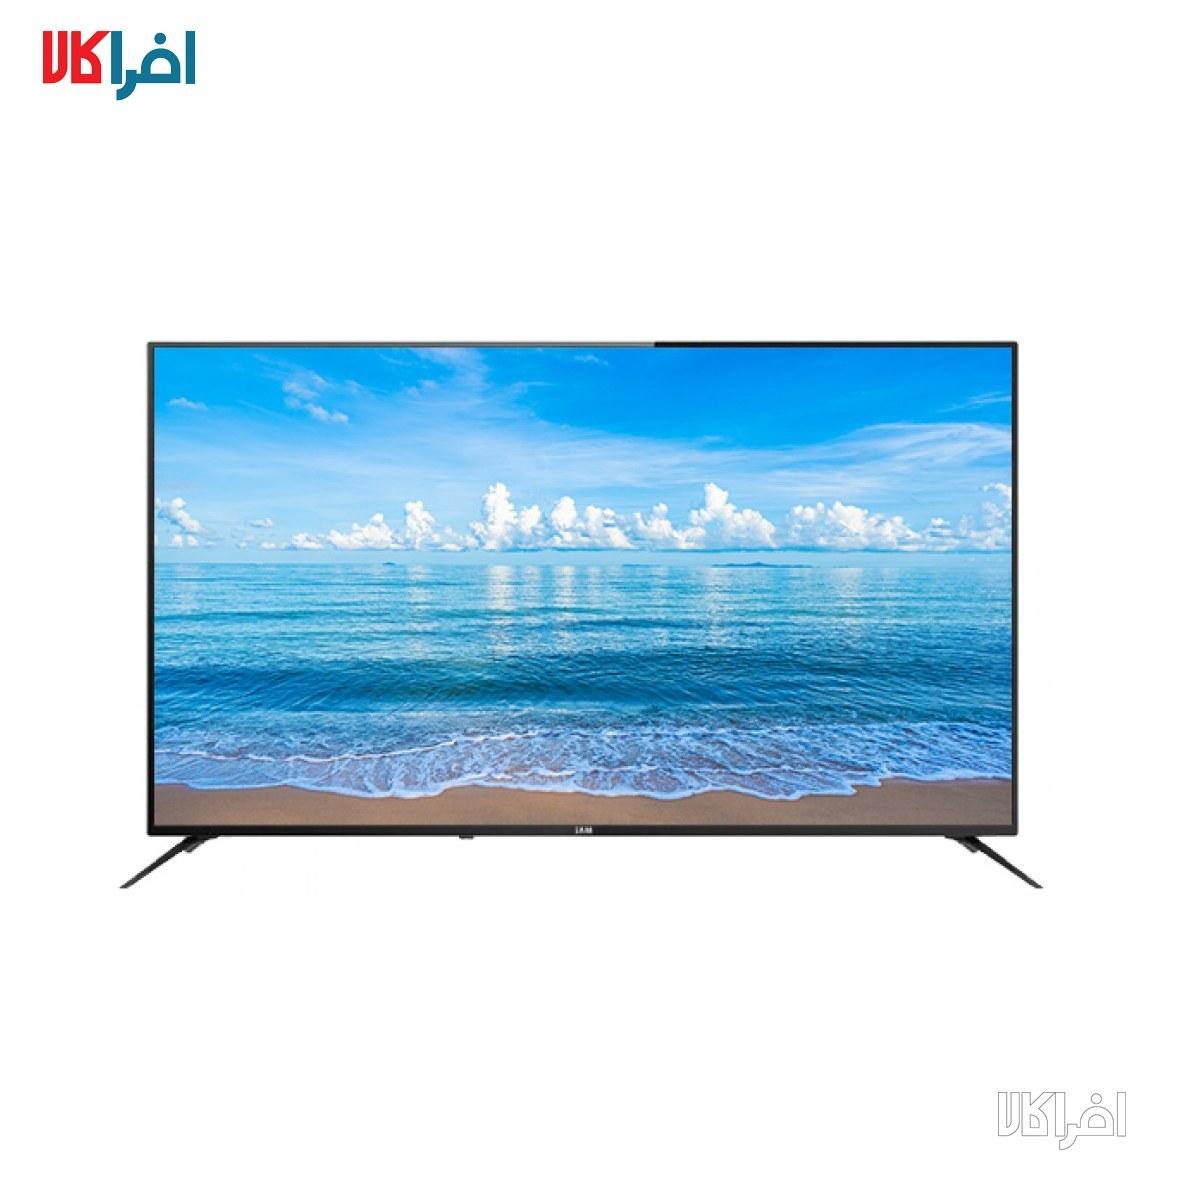 عکس تلویزیون ال ای دی سام سری T مدل 55Tu6500 Sam T Series LED TV Model 55Tu6500 تلویزیون-ال-ای-دی-سام-سری-t-مدل-55tu6500